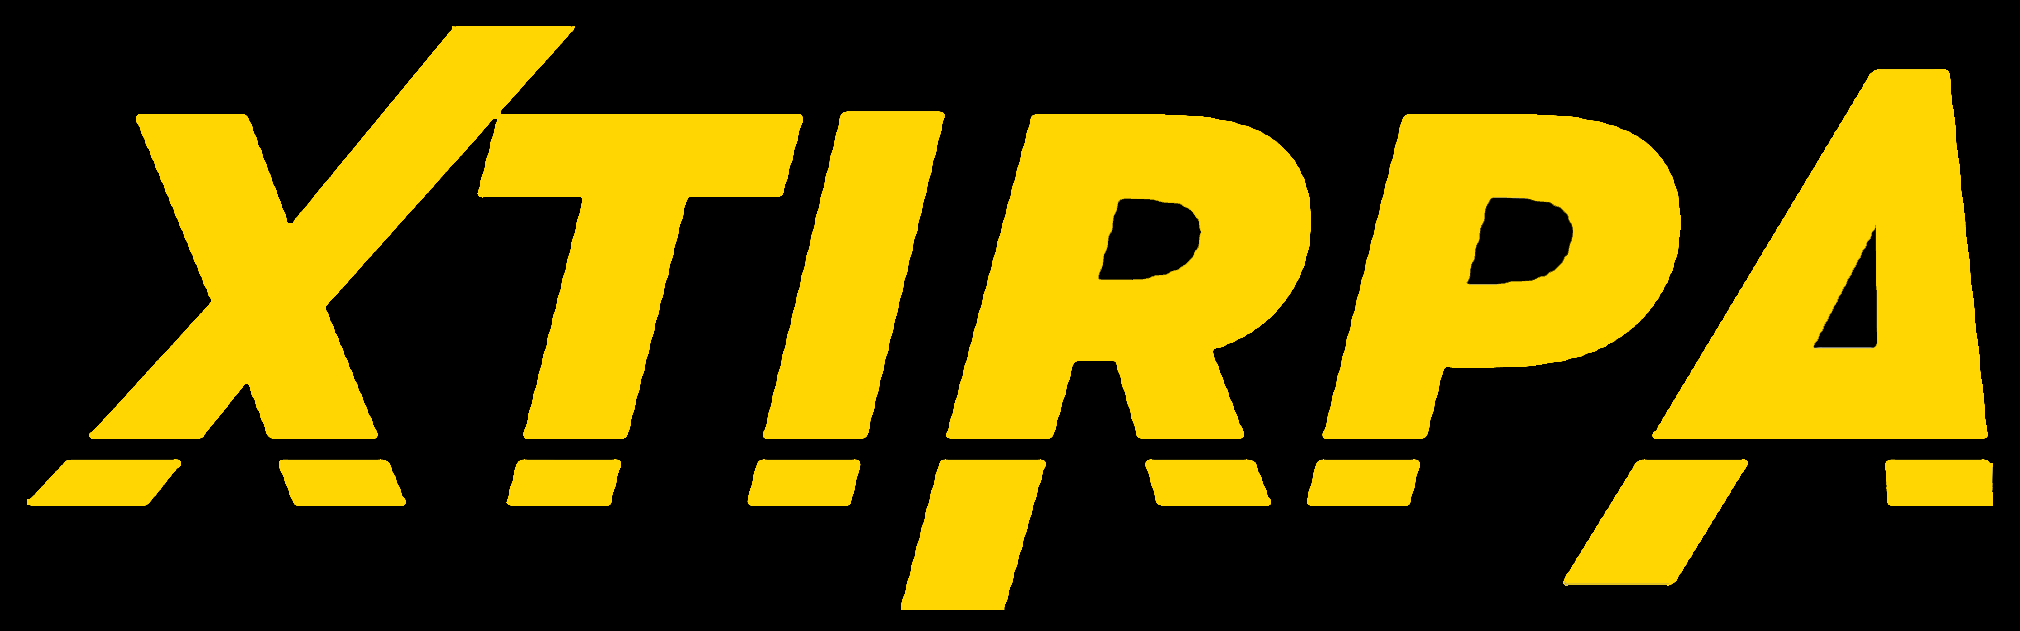 XTIRPA